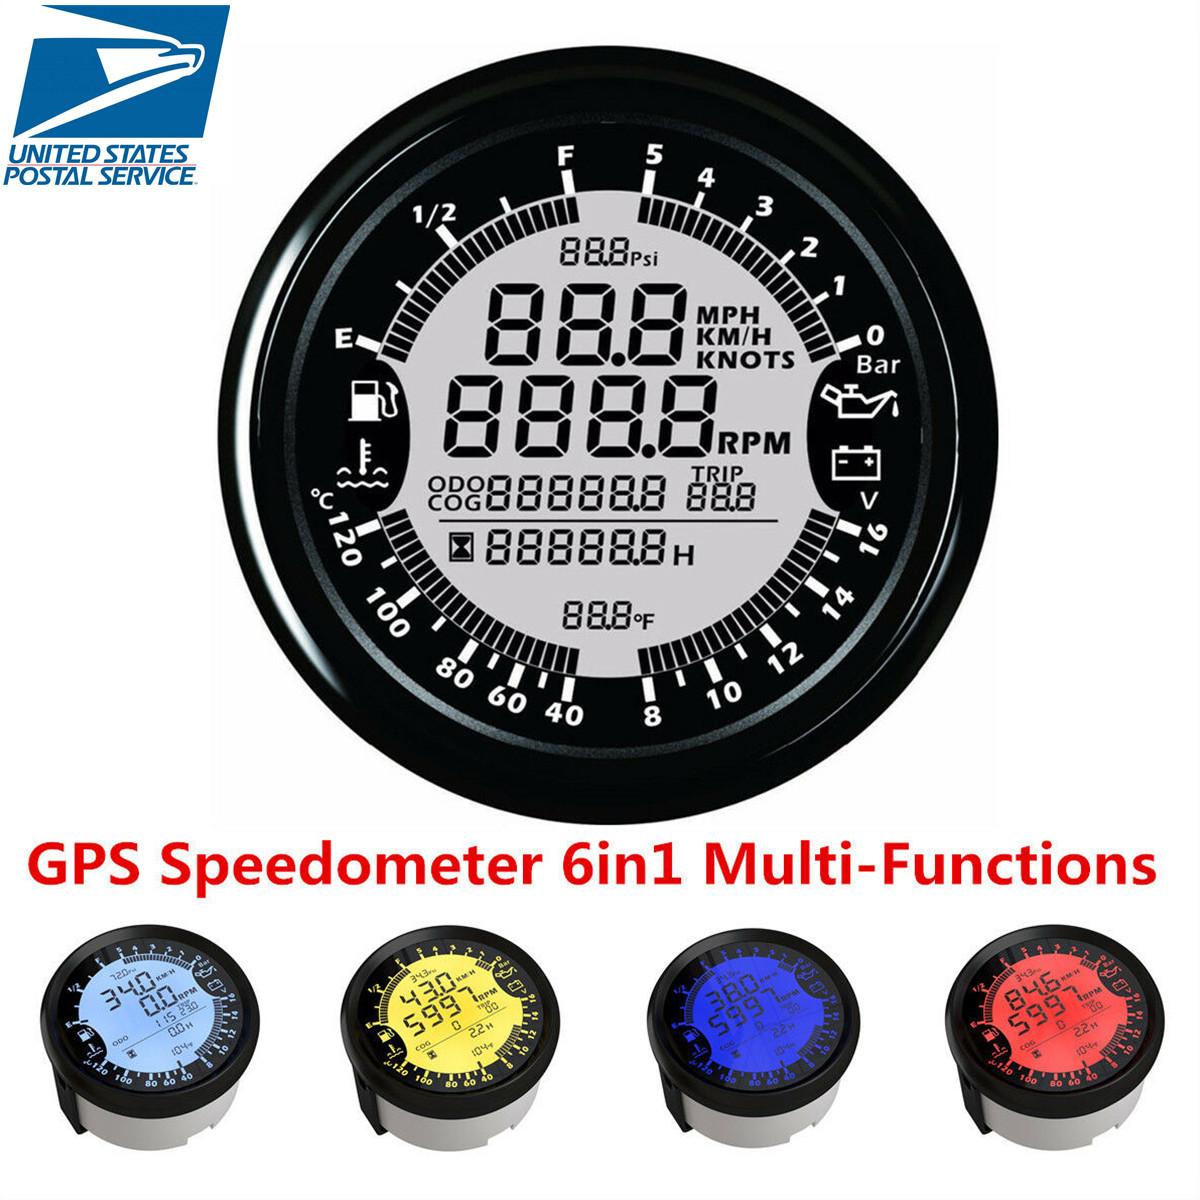 hight resolution of details about 6in1 multi function gps speedometer tachometer gauge water temp volt meter 85mm